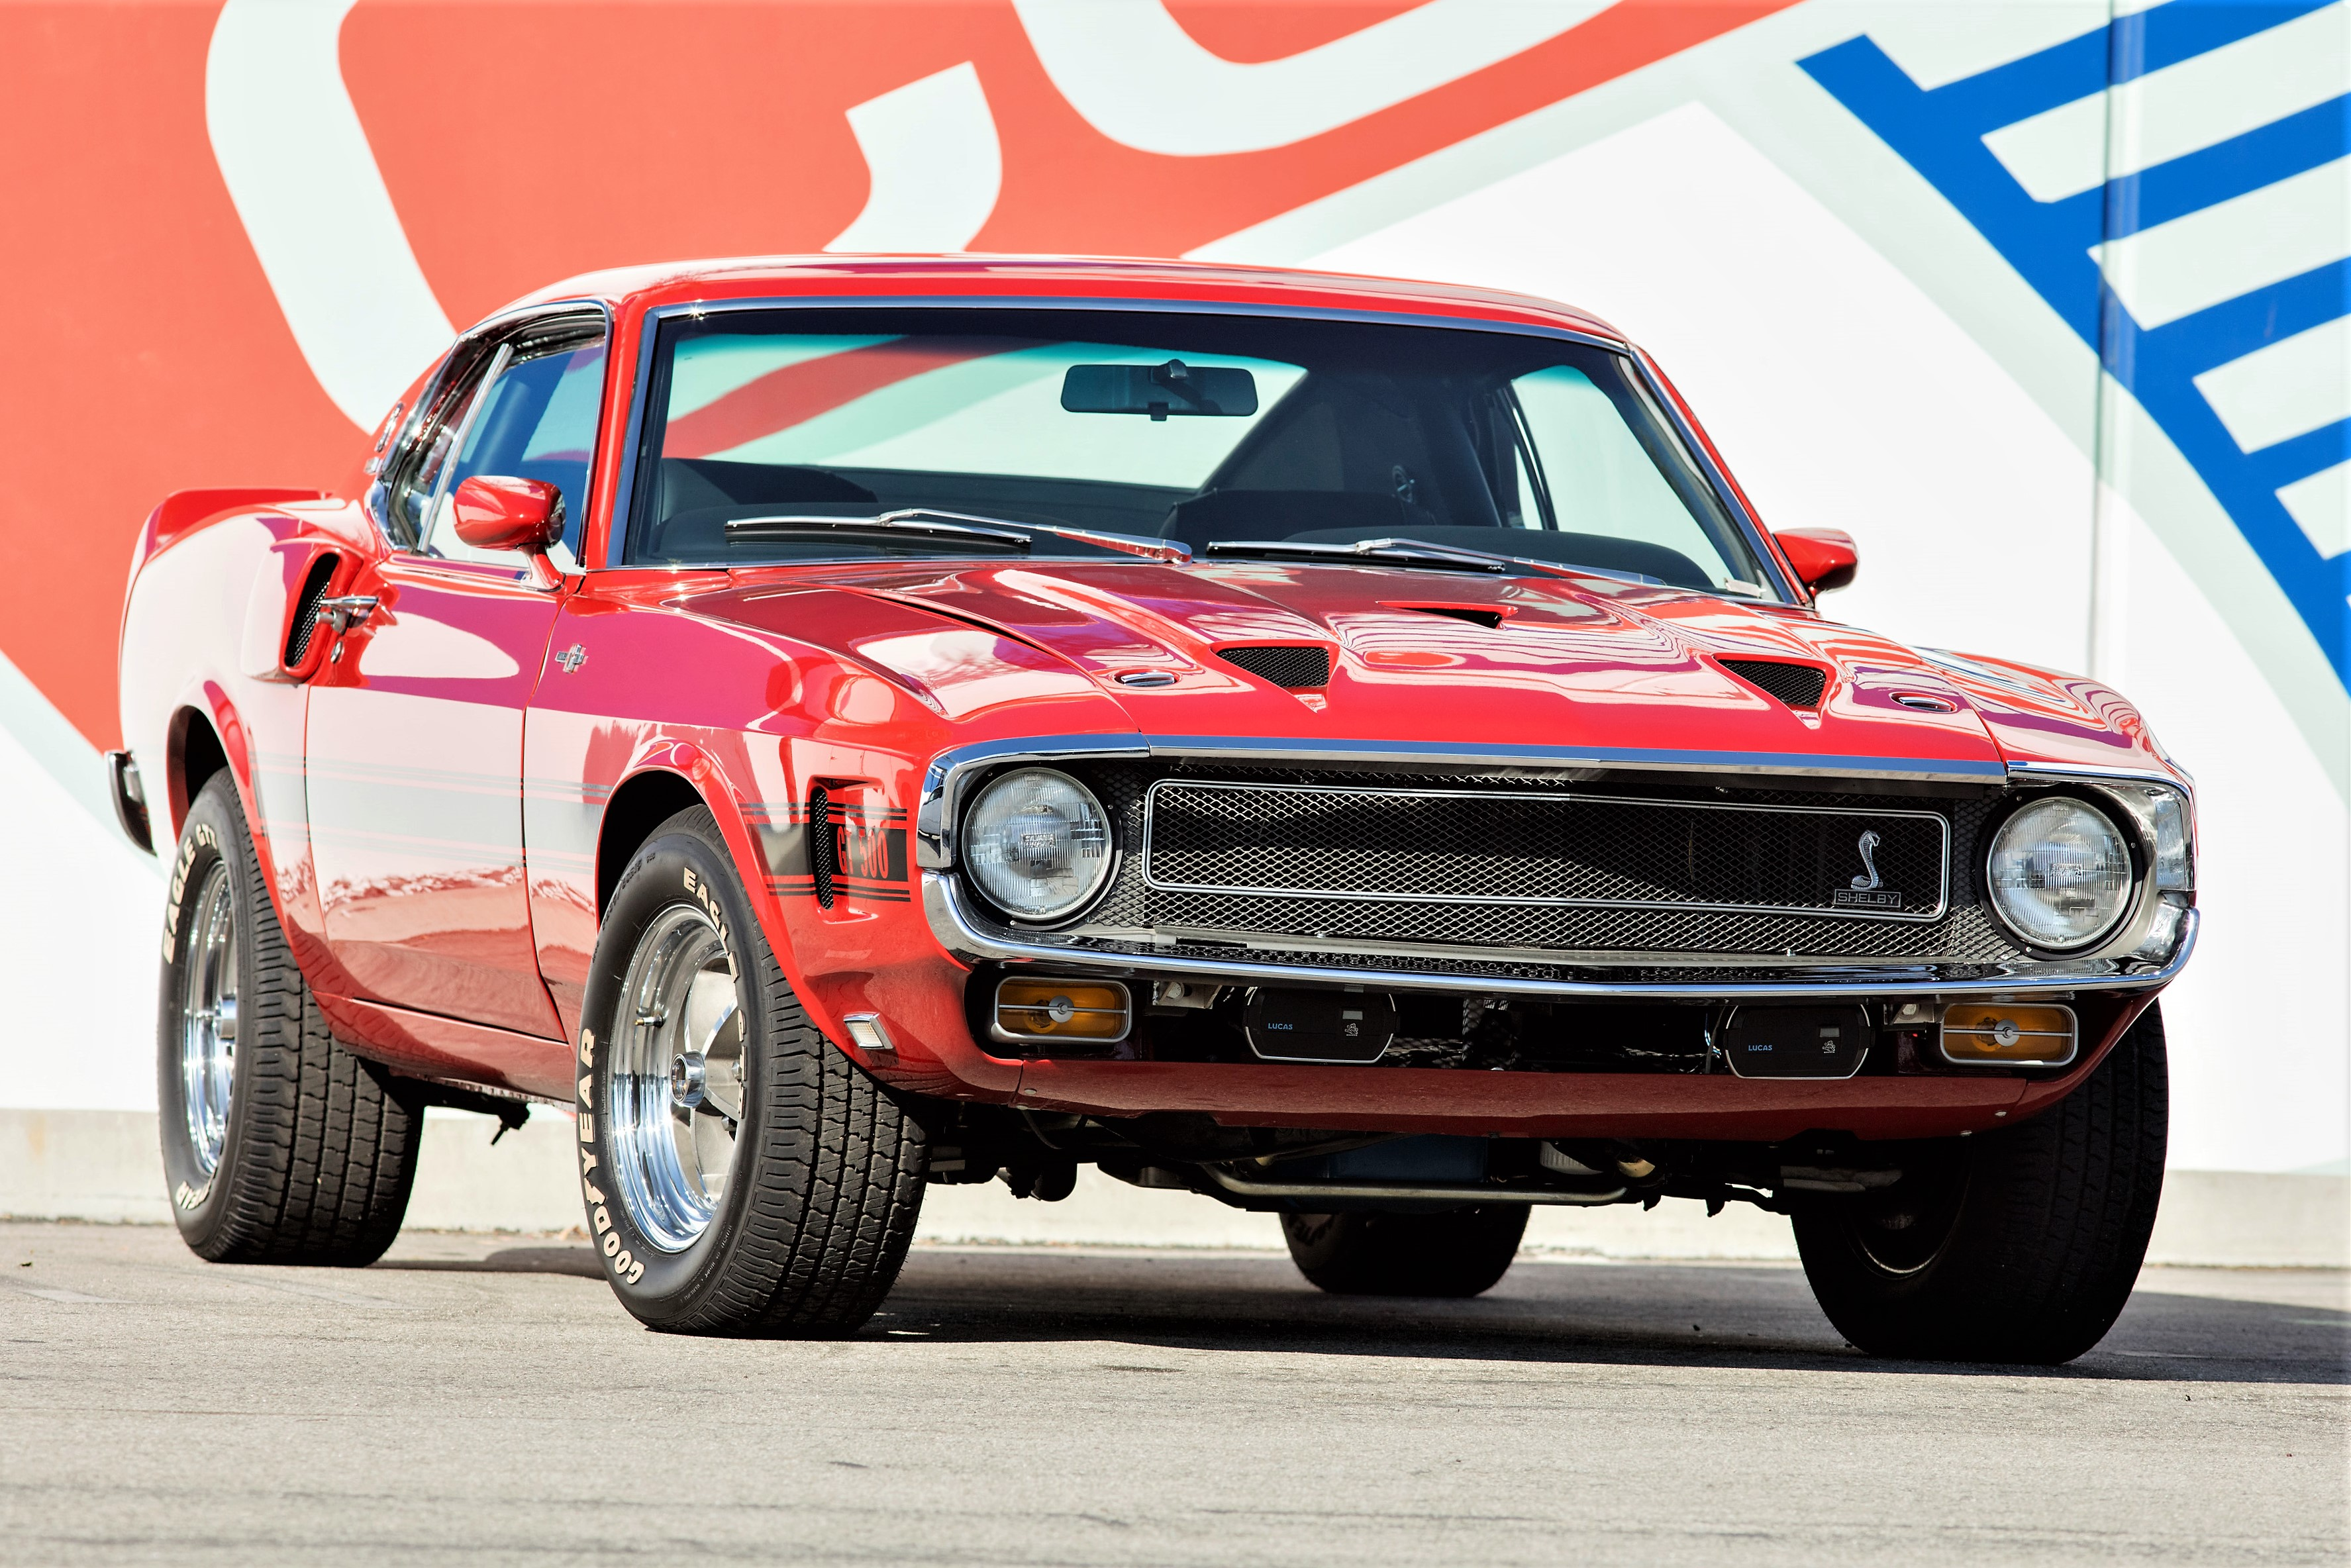 Carroll Shelby's 24-car Collection Set For Bonhams Auction